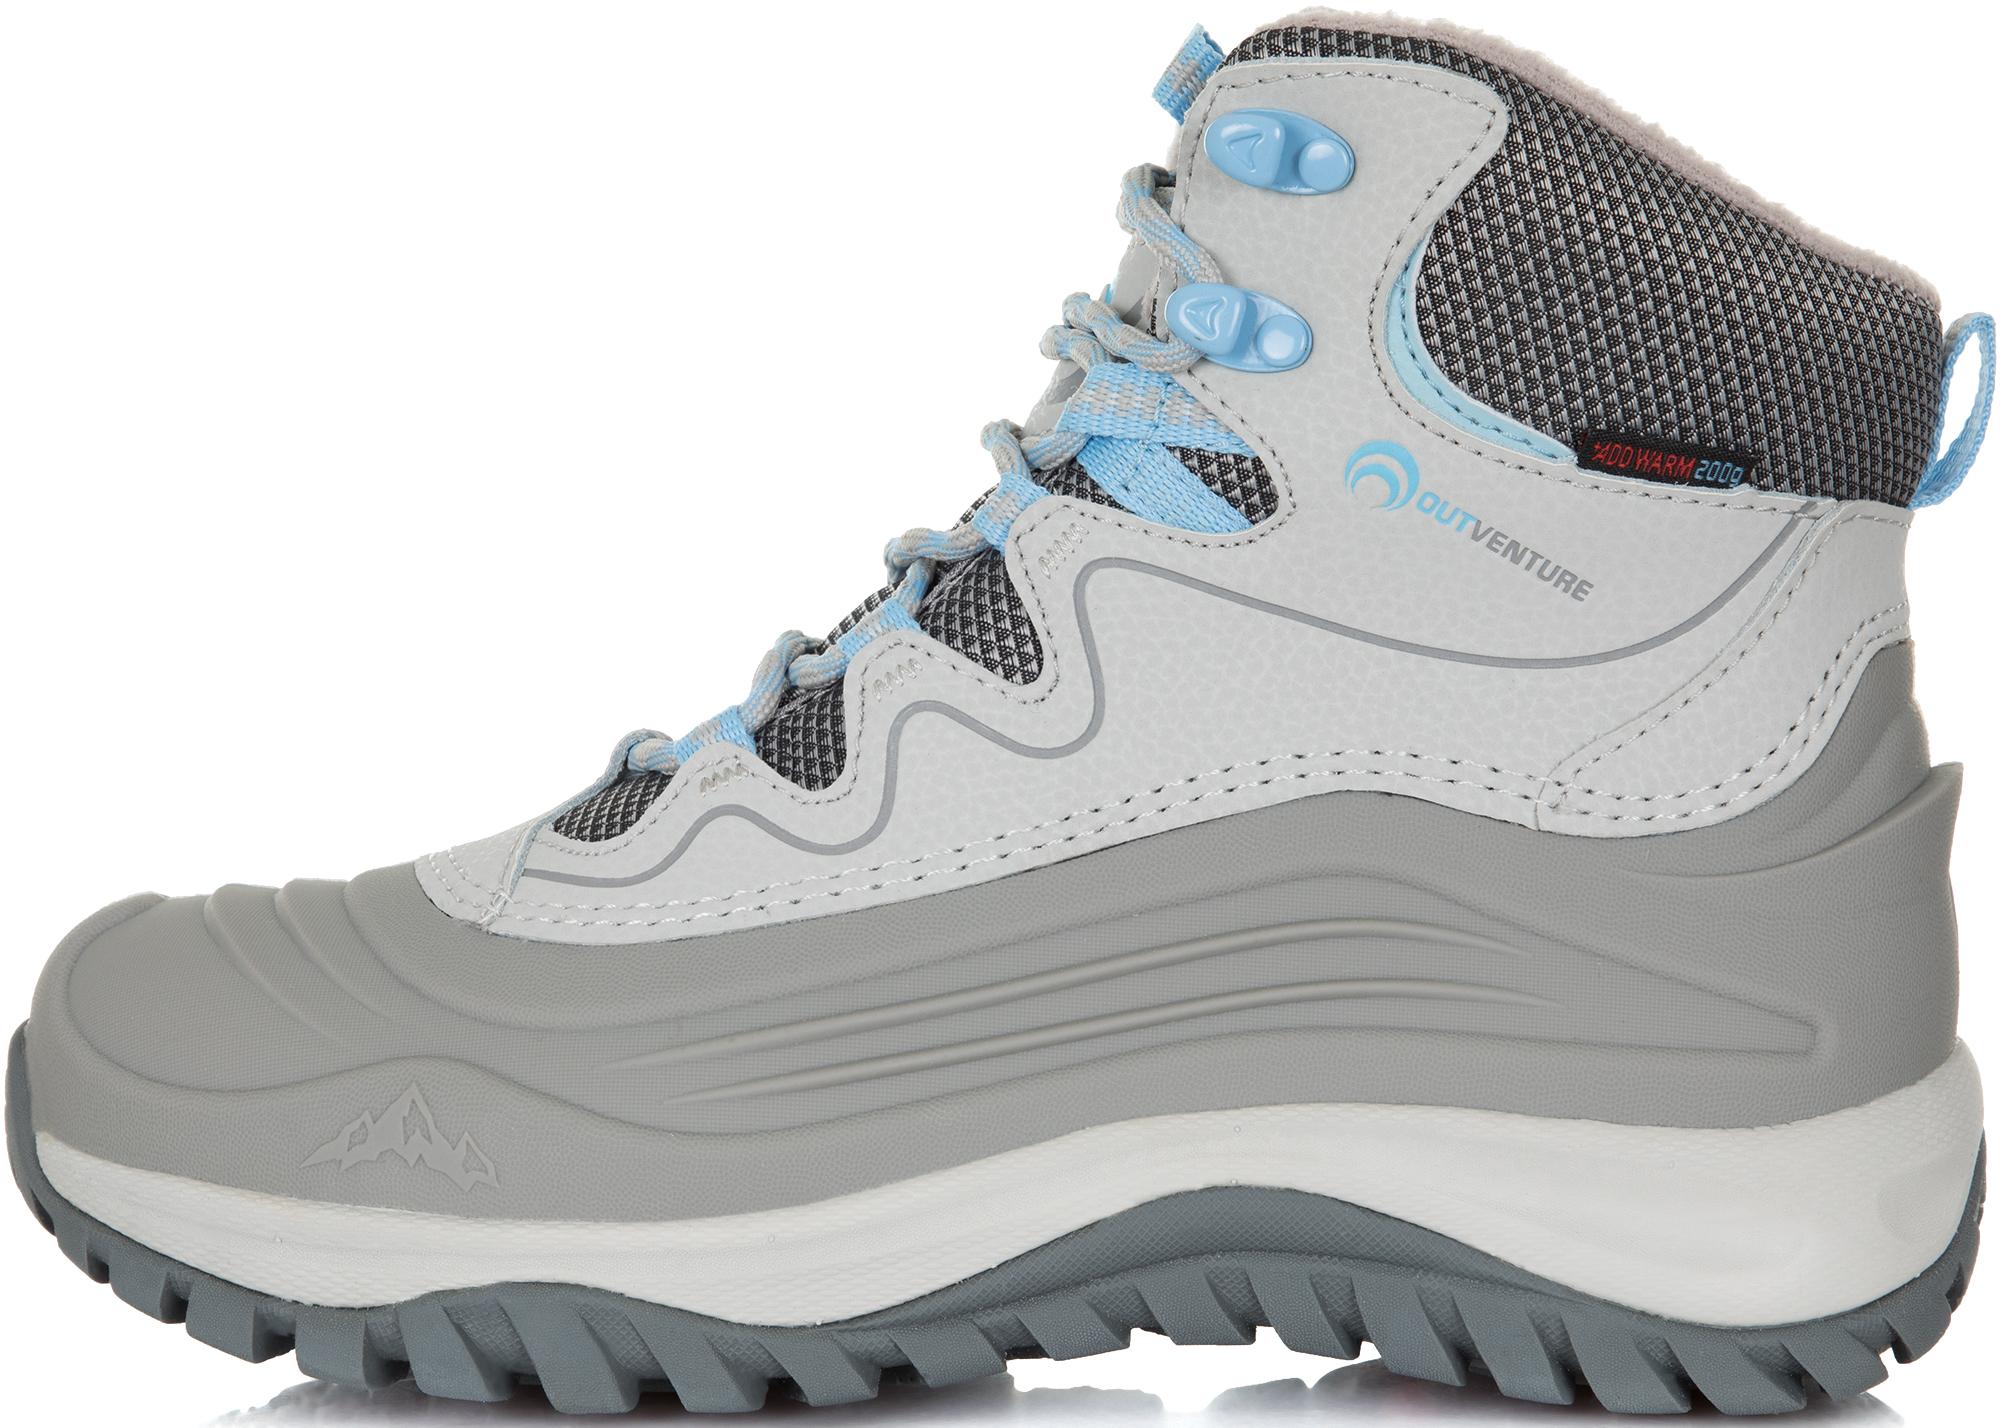 Outventure Ботинки утепленные женские Outventure Frostflower, размер 41 outventure ботинки утепленные для мальчиков outventure